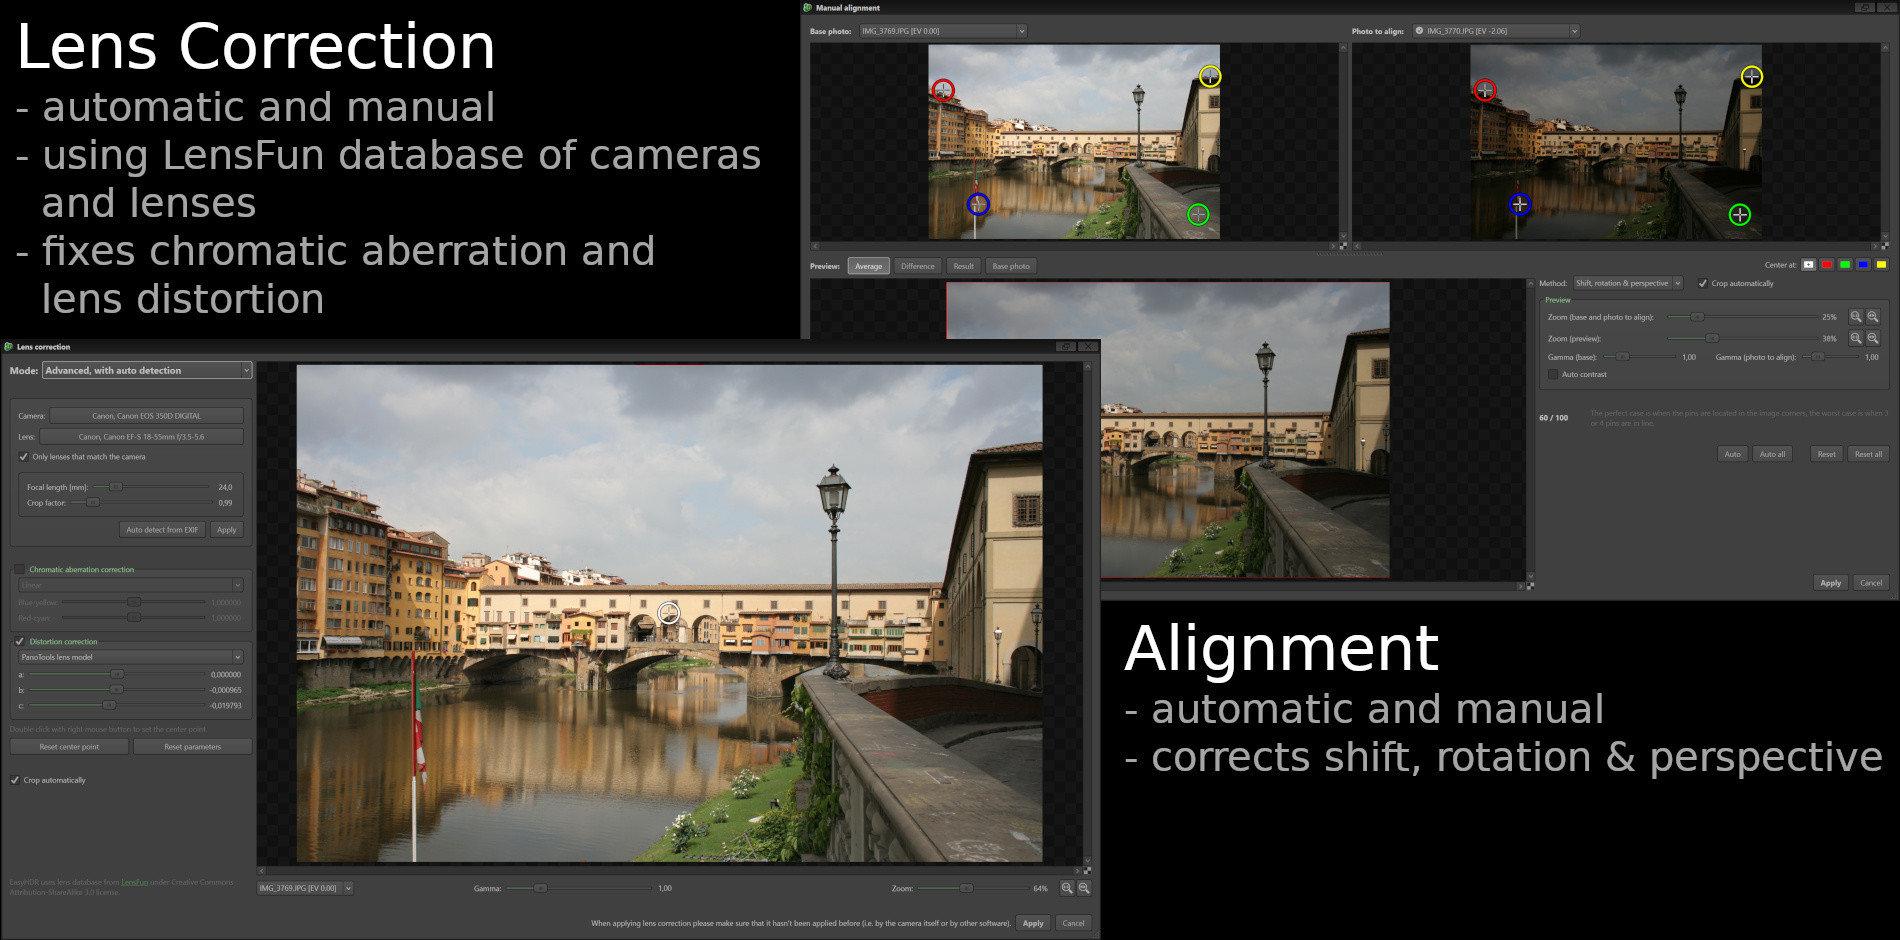 easyHDR - High Dynamic Range image processing software